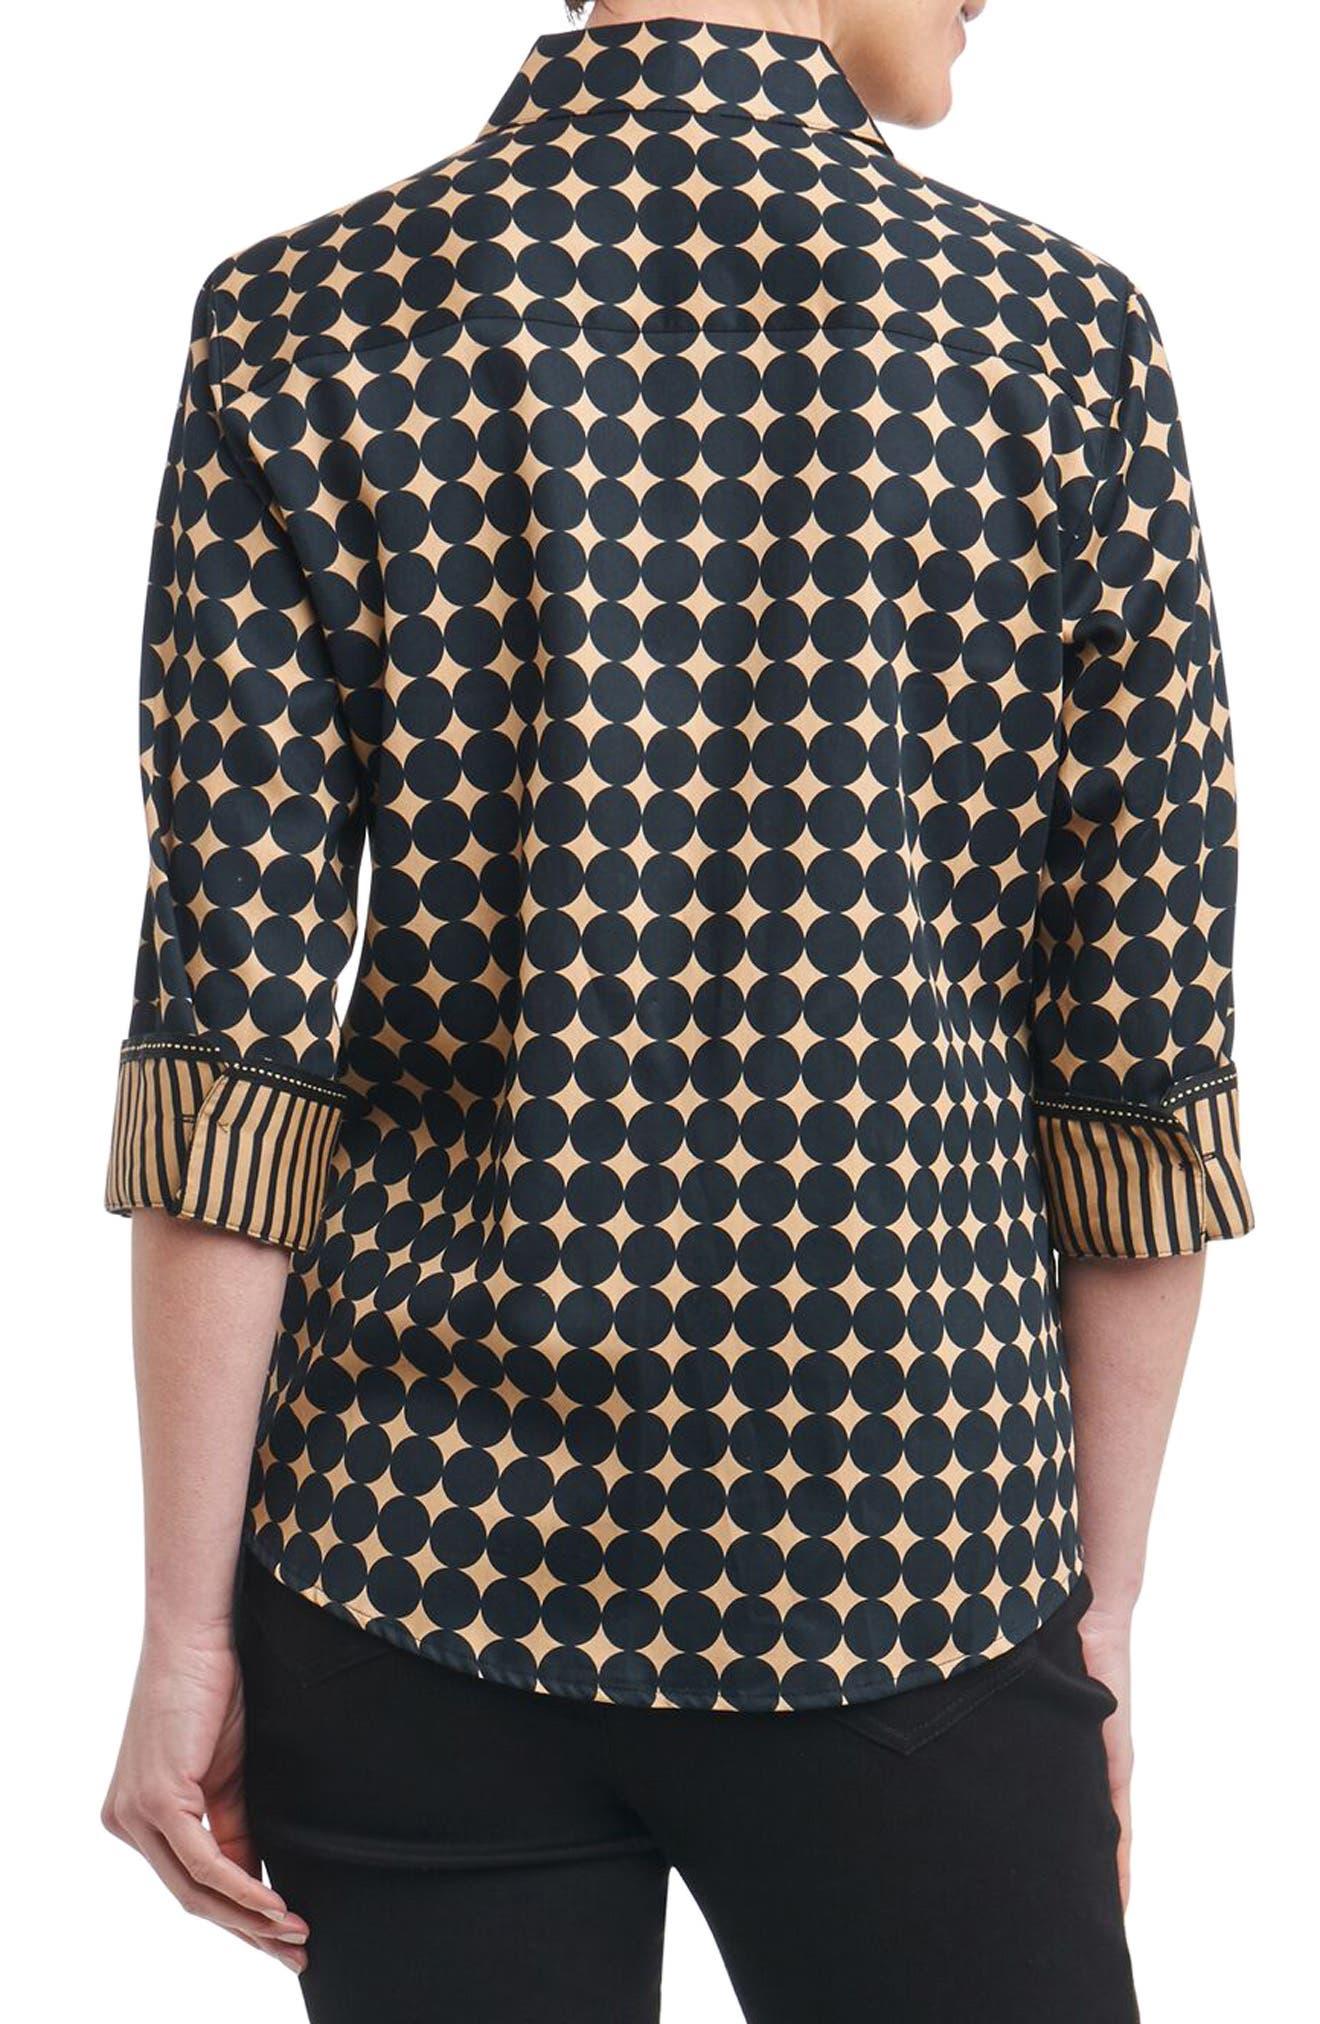 Ava Non-Iron Dot Print Cotton Shirt,                             Alternate thumbnail 2, color,                             013